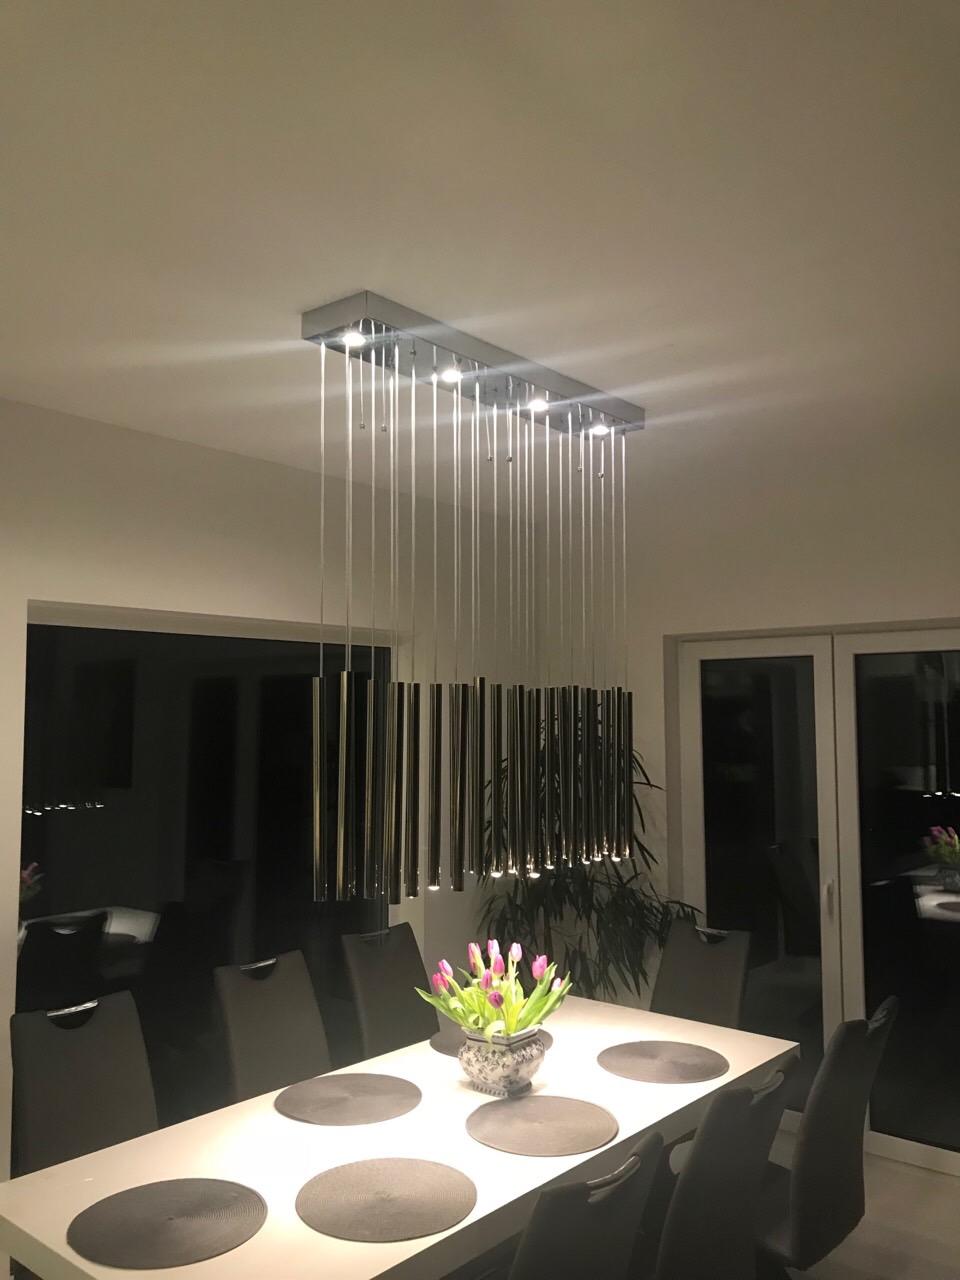 Lampa Sufitowa Salon Kuchnia Jadalnia Nowoczesna 7174048705